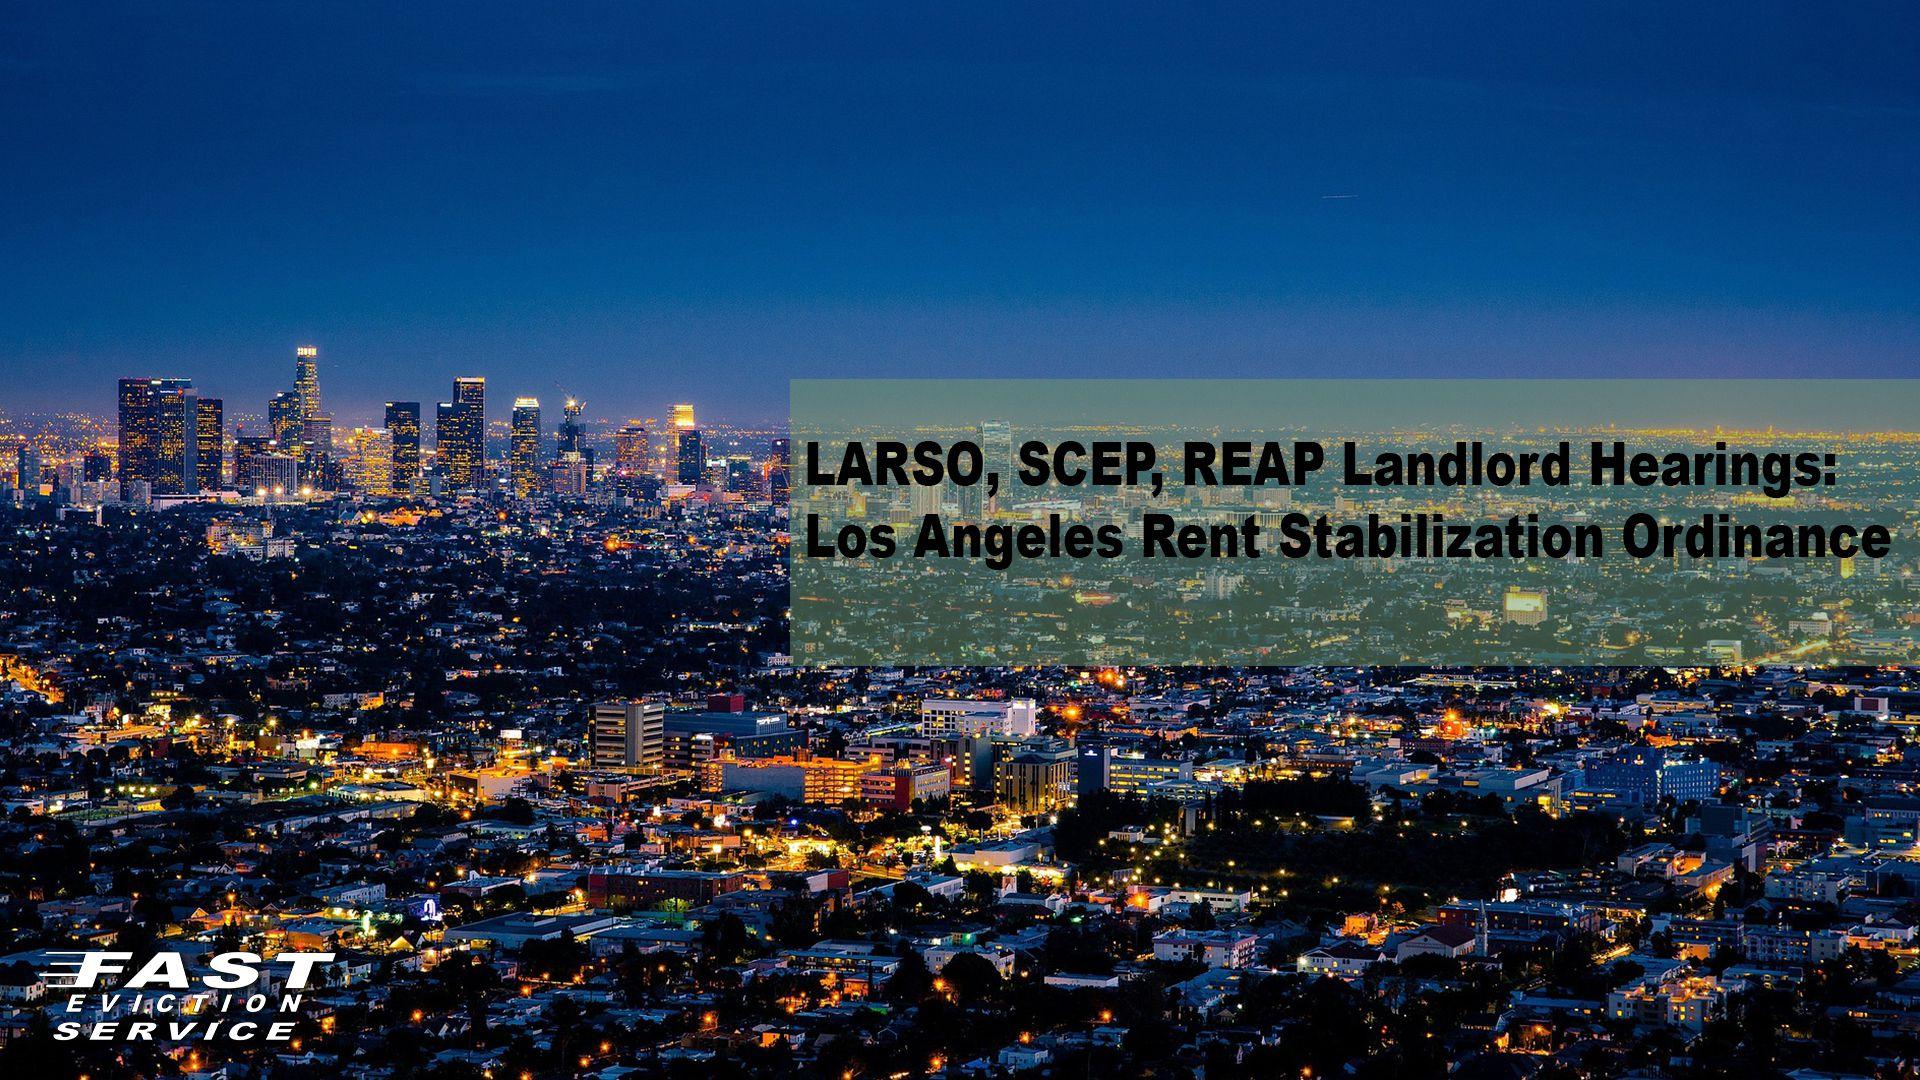 LARSO, SCEP, REAP Landlord Hearings: Los Angeles Rent